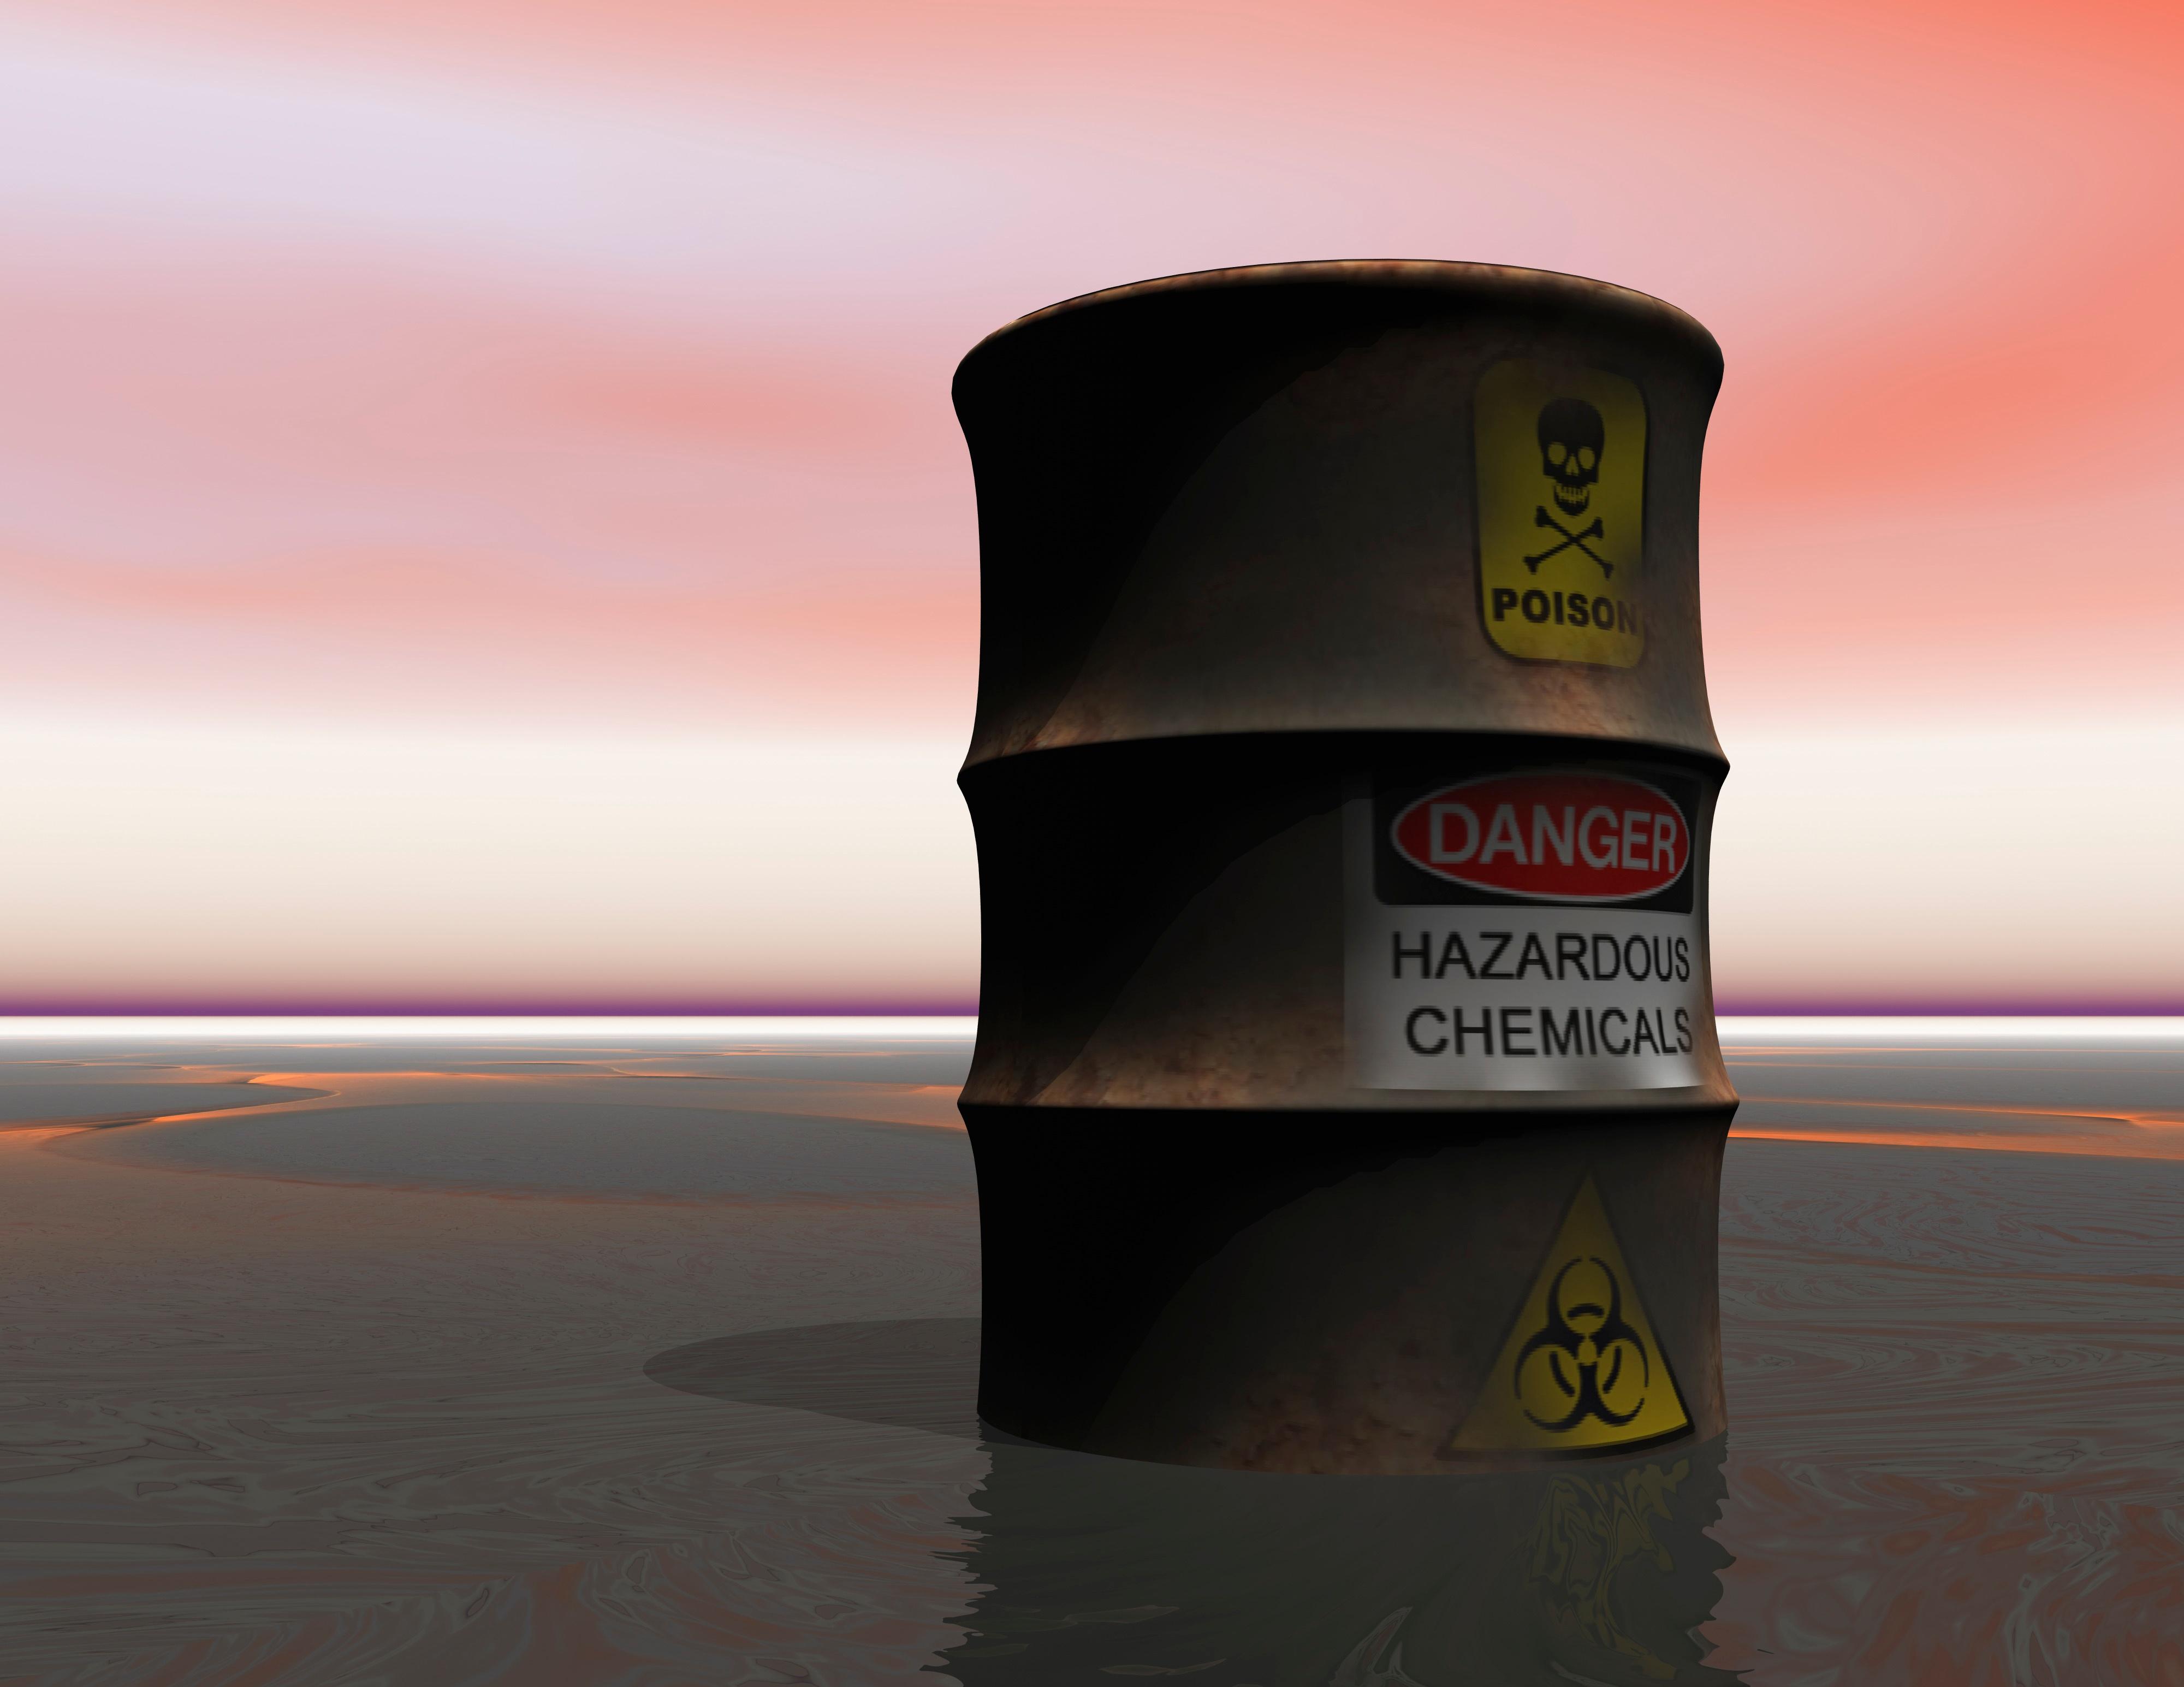 Hazardous waste generators